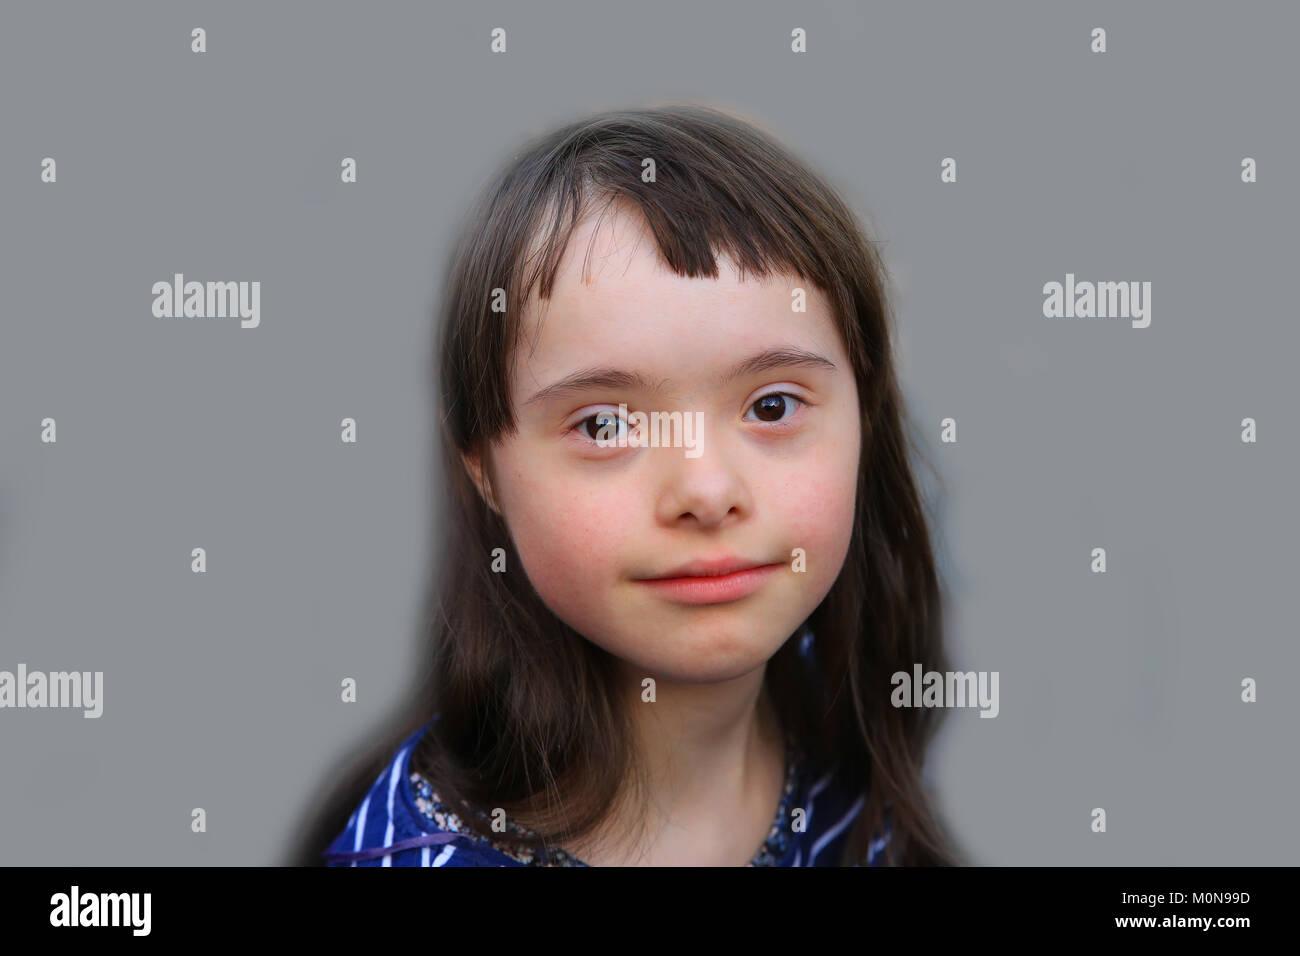 eastenders-pretty-white-girl-syndrome-plug-cheerleader-kimberly